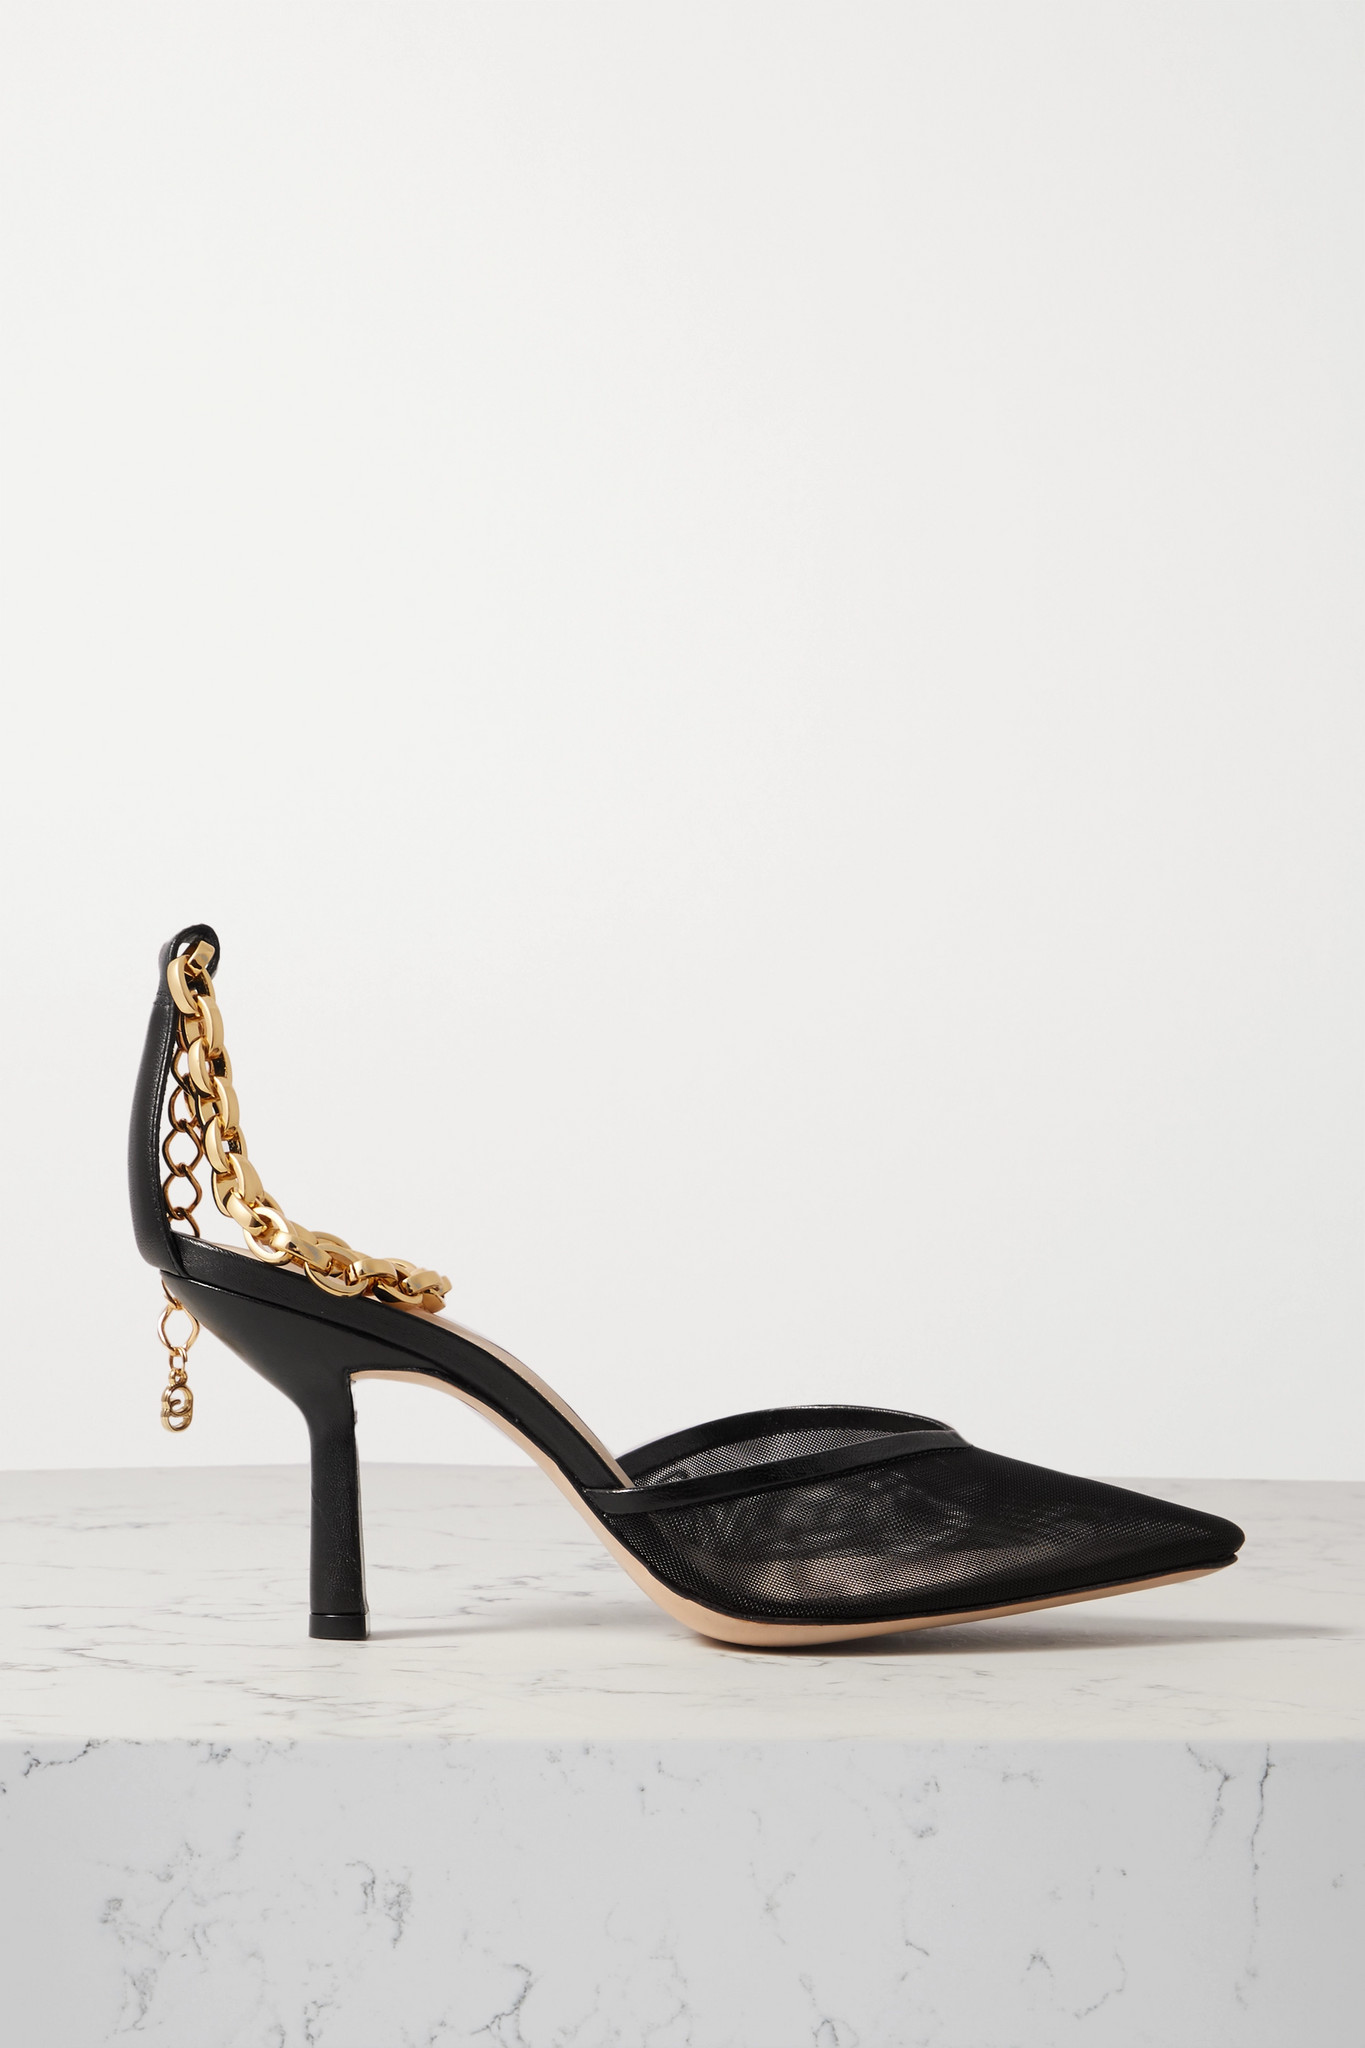 PORTE & PAIRE - 链条缀饰网布皮革高跟鞋 - 黑色 - IT40.5